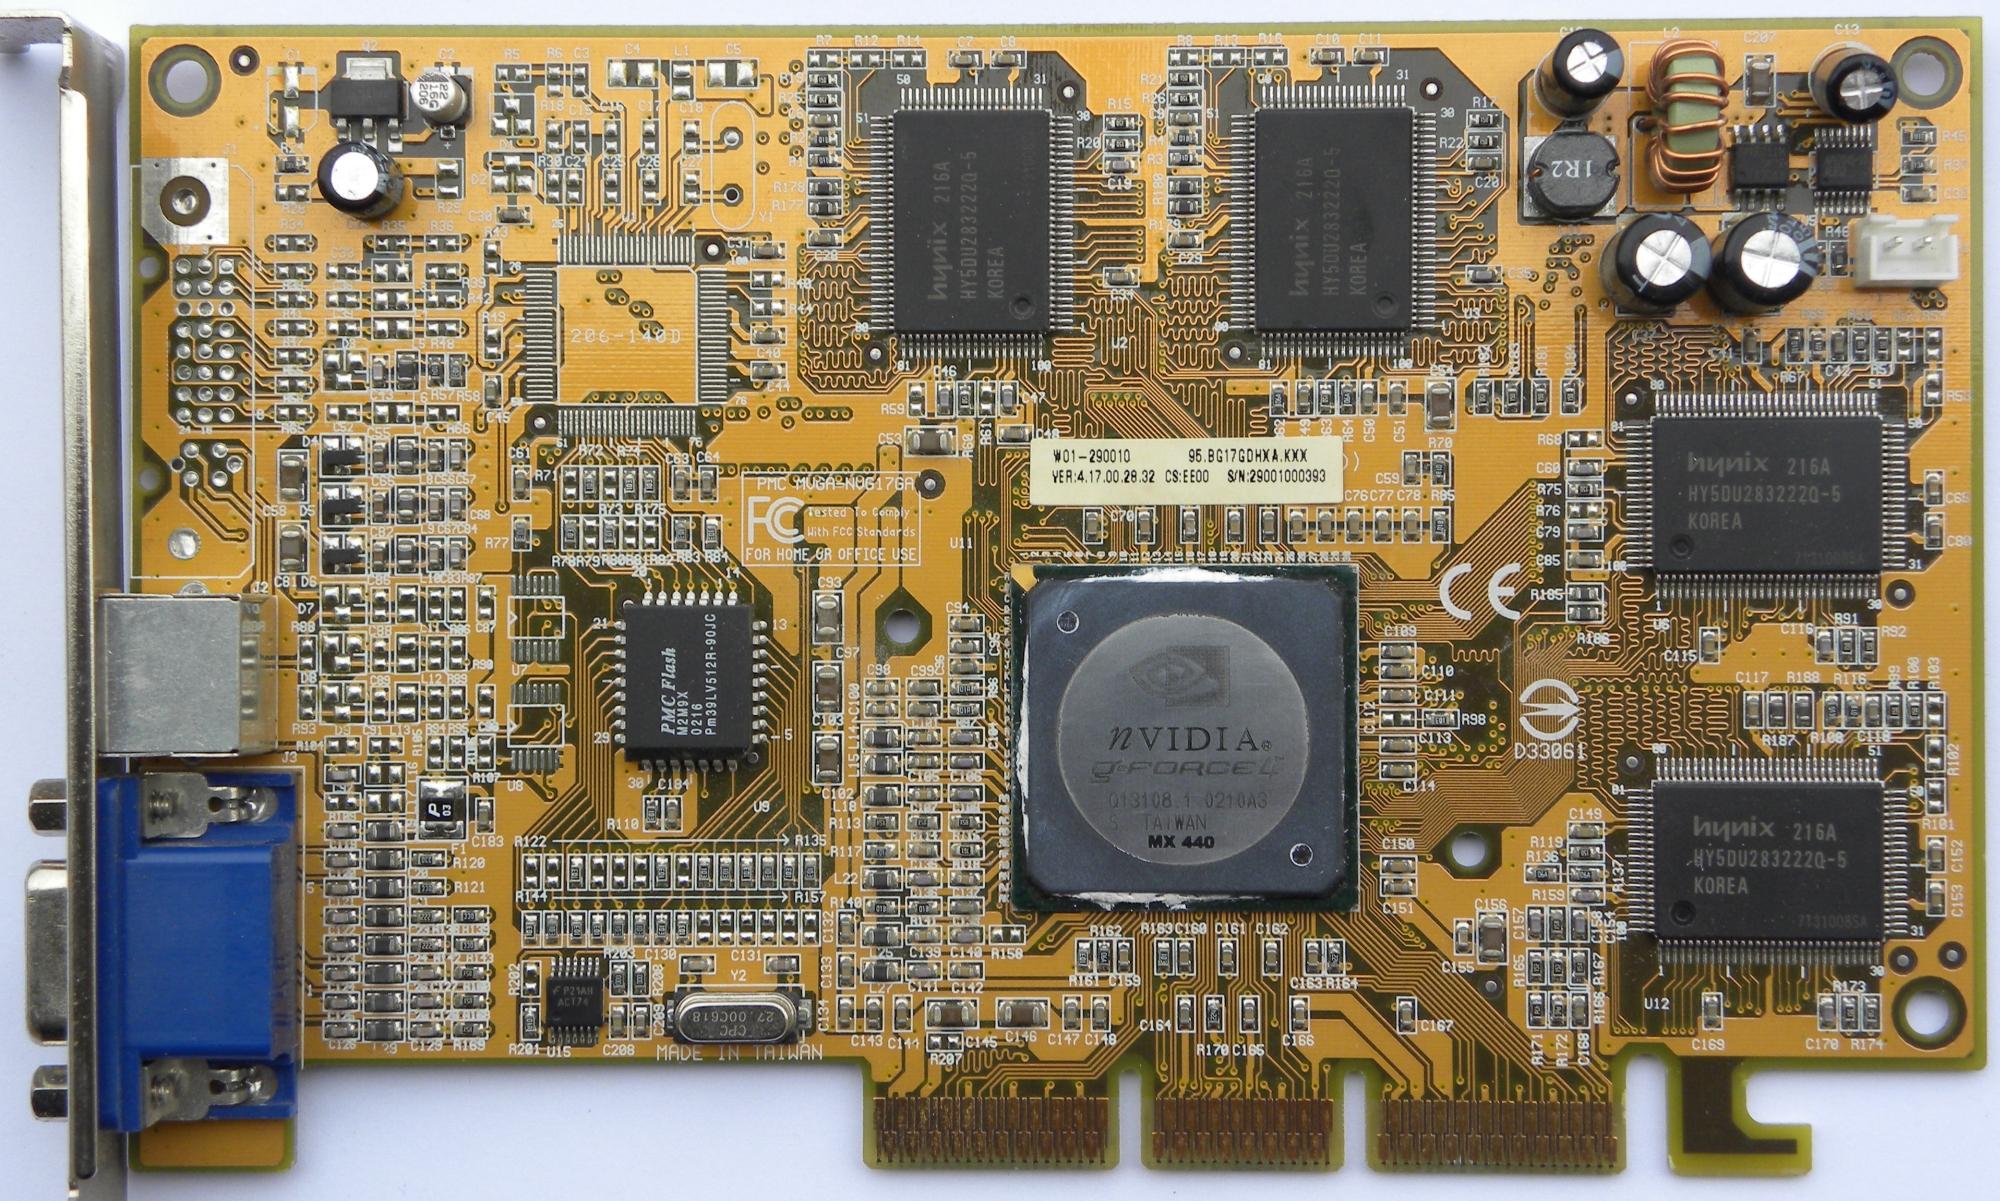 Nvidia geforce4 mx 440 agp 4x 64mb specification.